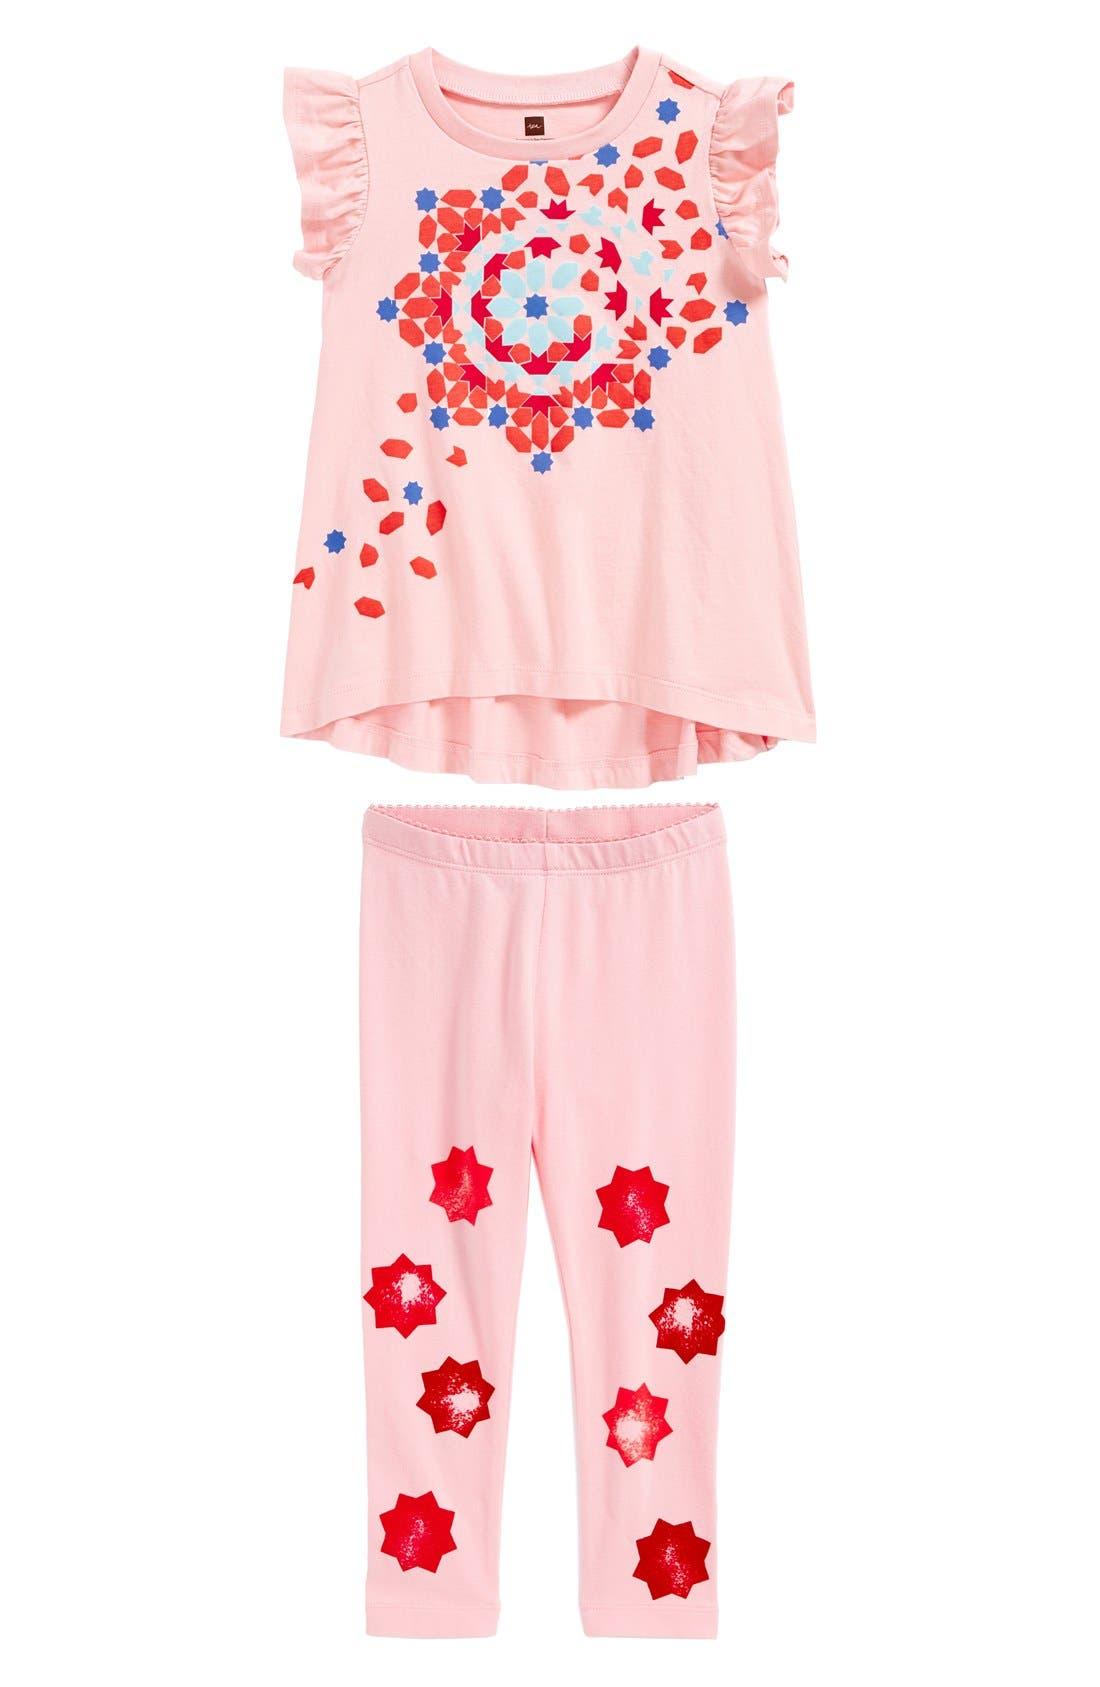 Alternate Image 1 Selected - Tea Collection Tee & Leggings (Toddler Girls)